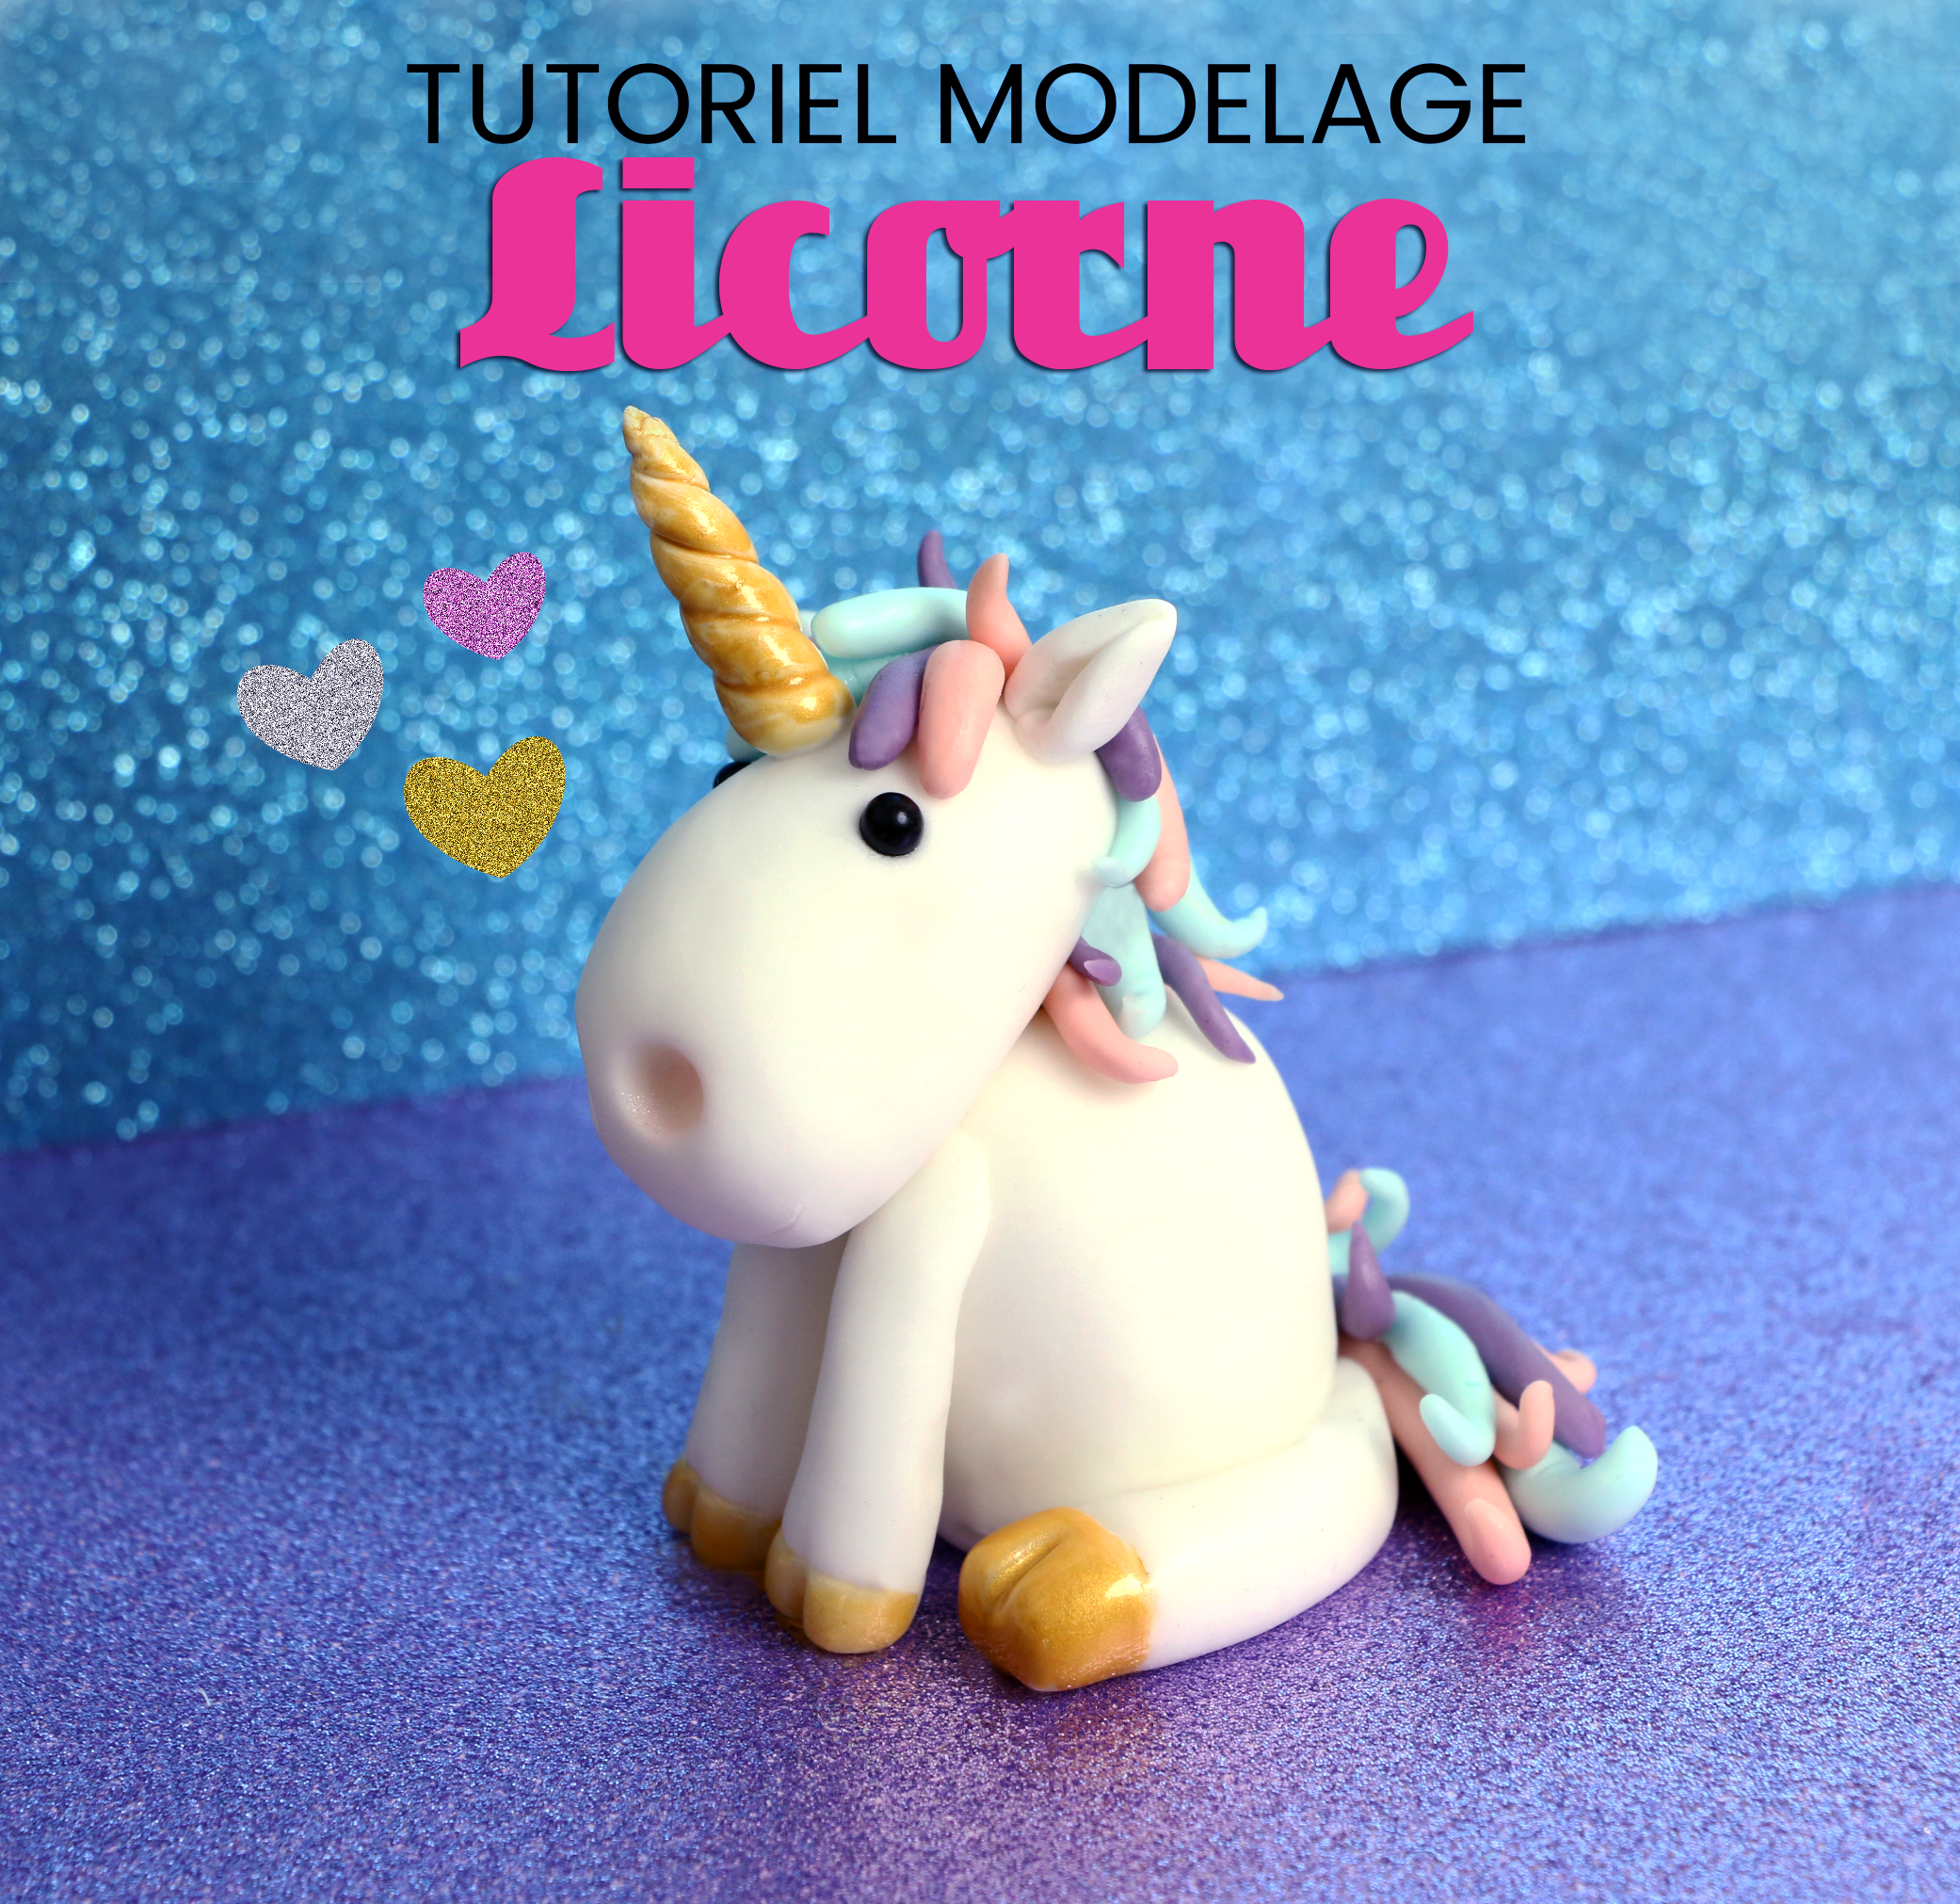 Modelage Licorne Le Tutoriel Feerie Cake